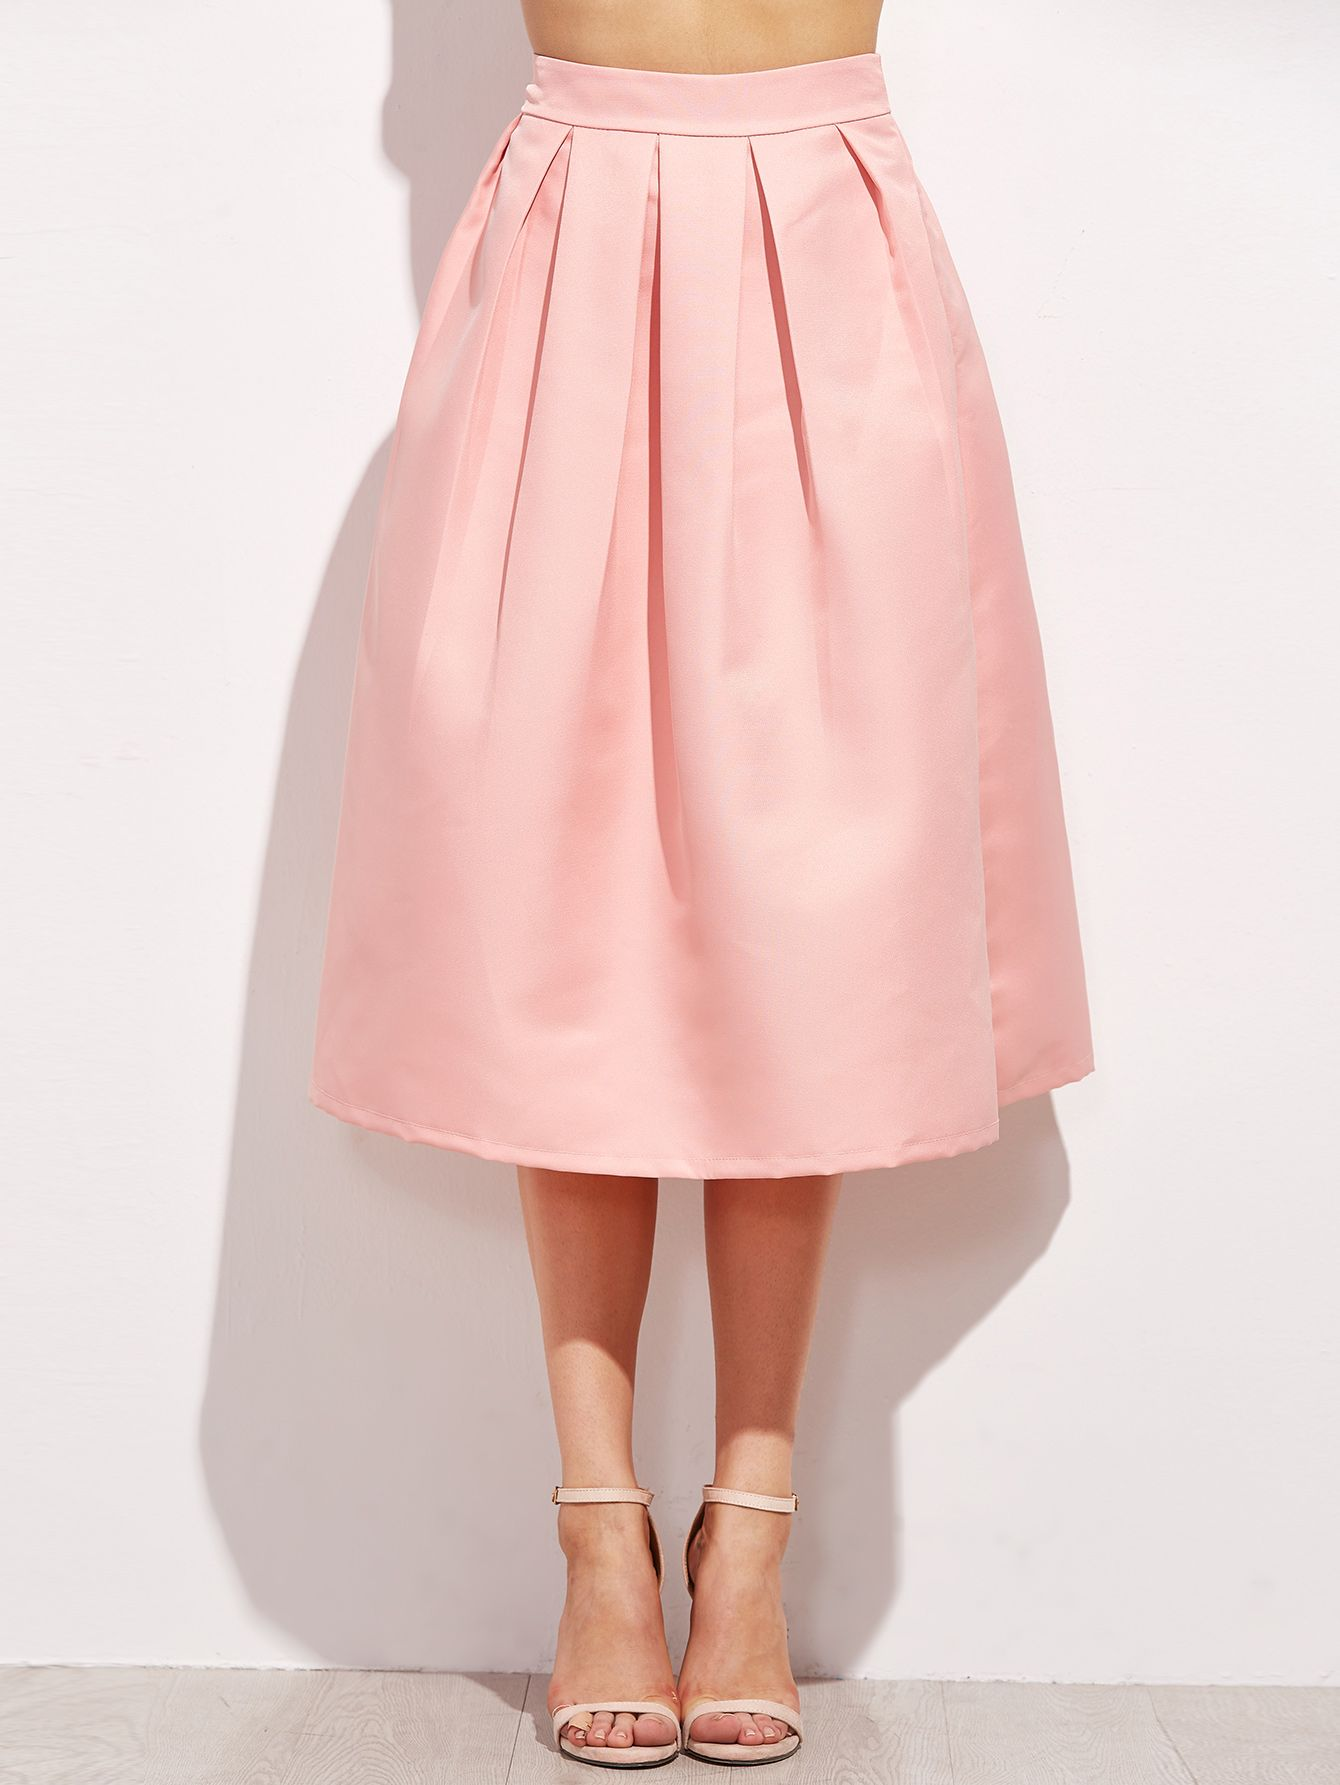 7487b5d1c5 Pink Zipper Side Flare Skirt -SheIn(Sheinside)   Clothes/fashion ...